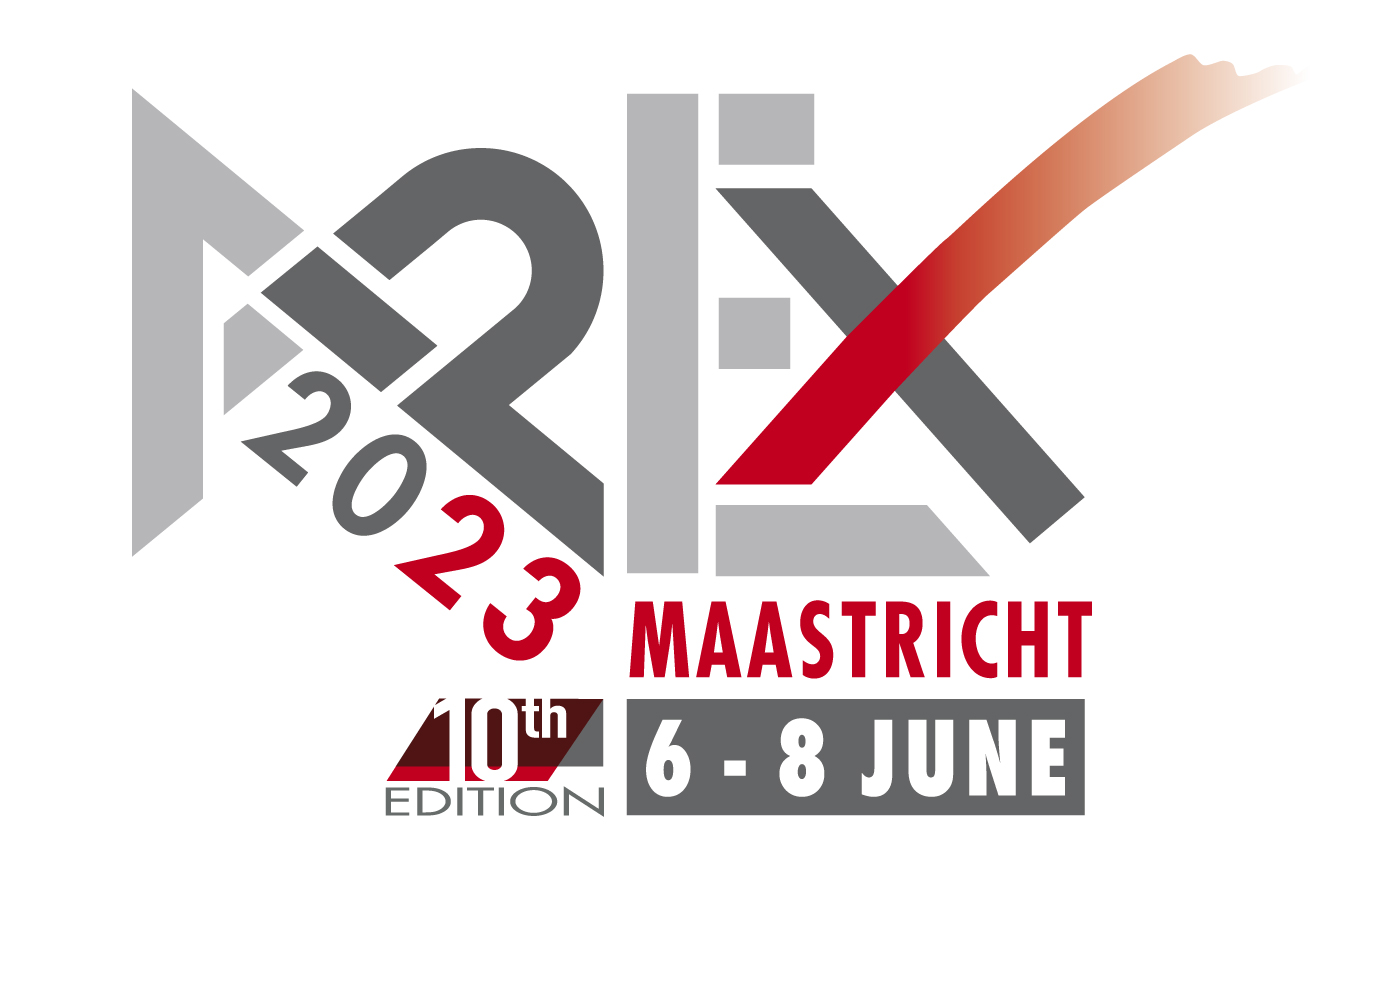 APEX SHOW 2023 - Maastricht, Pays-Bas